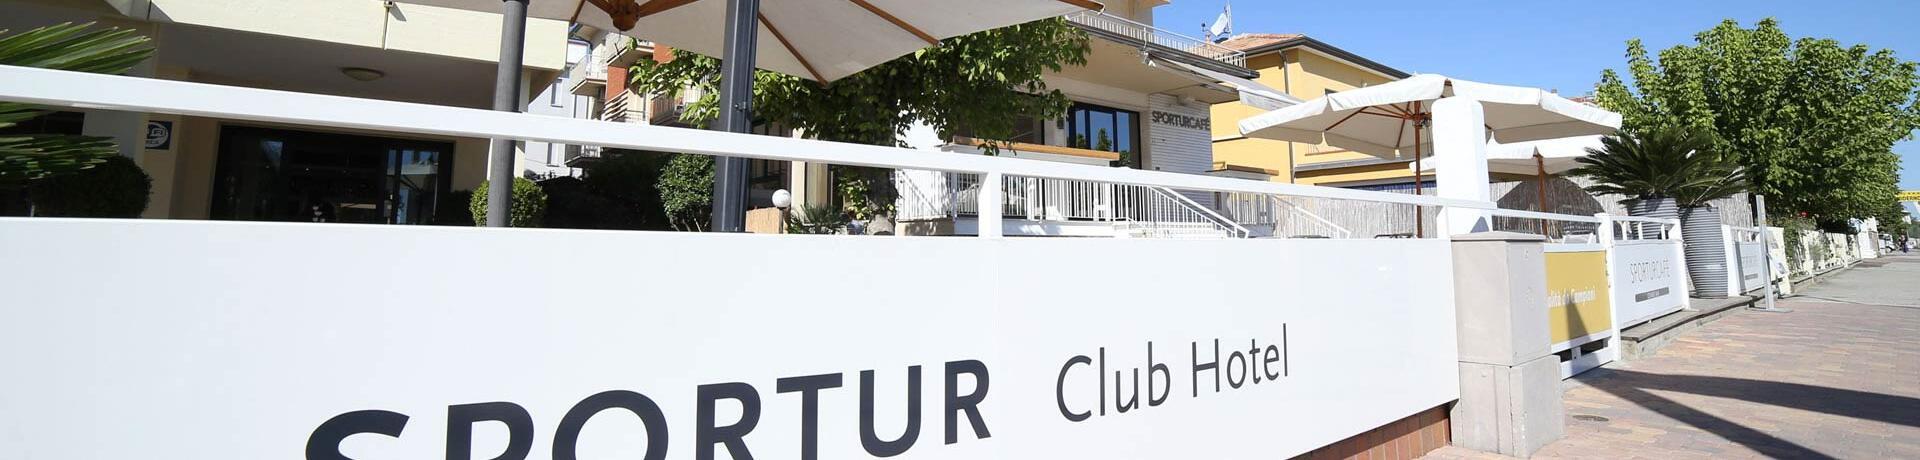 granfondoviadelsale it sportur-club-hotel 011